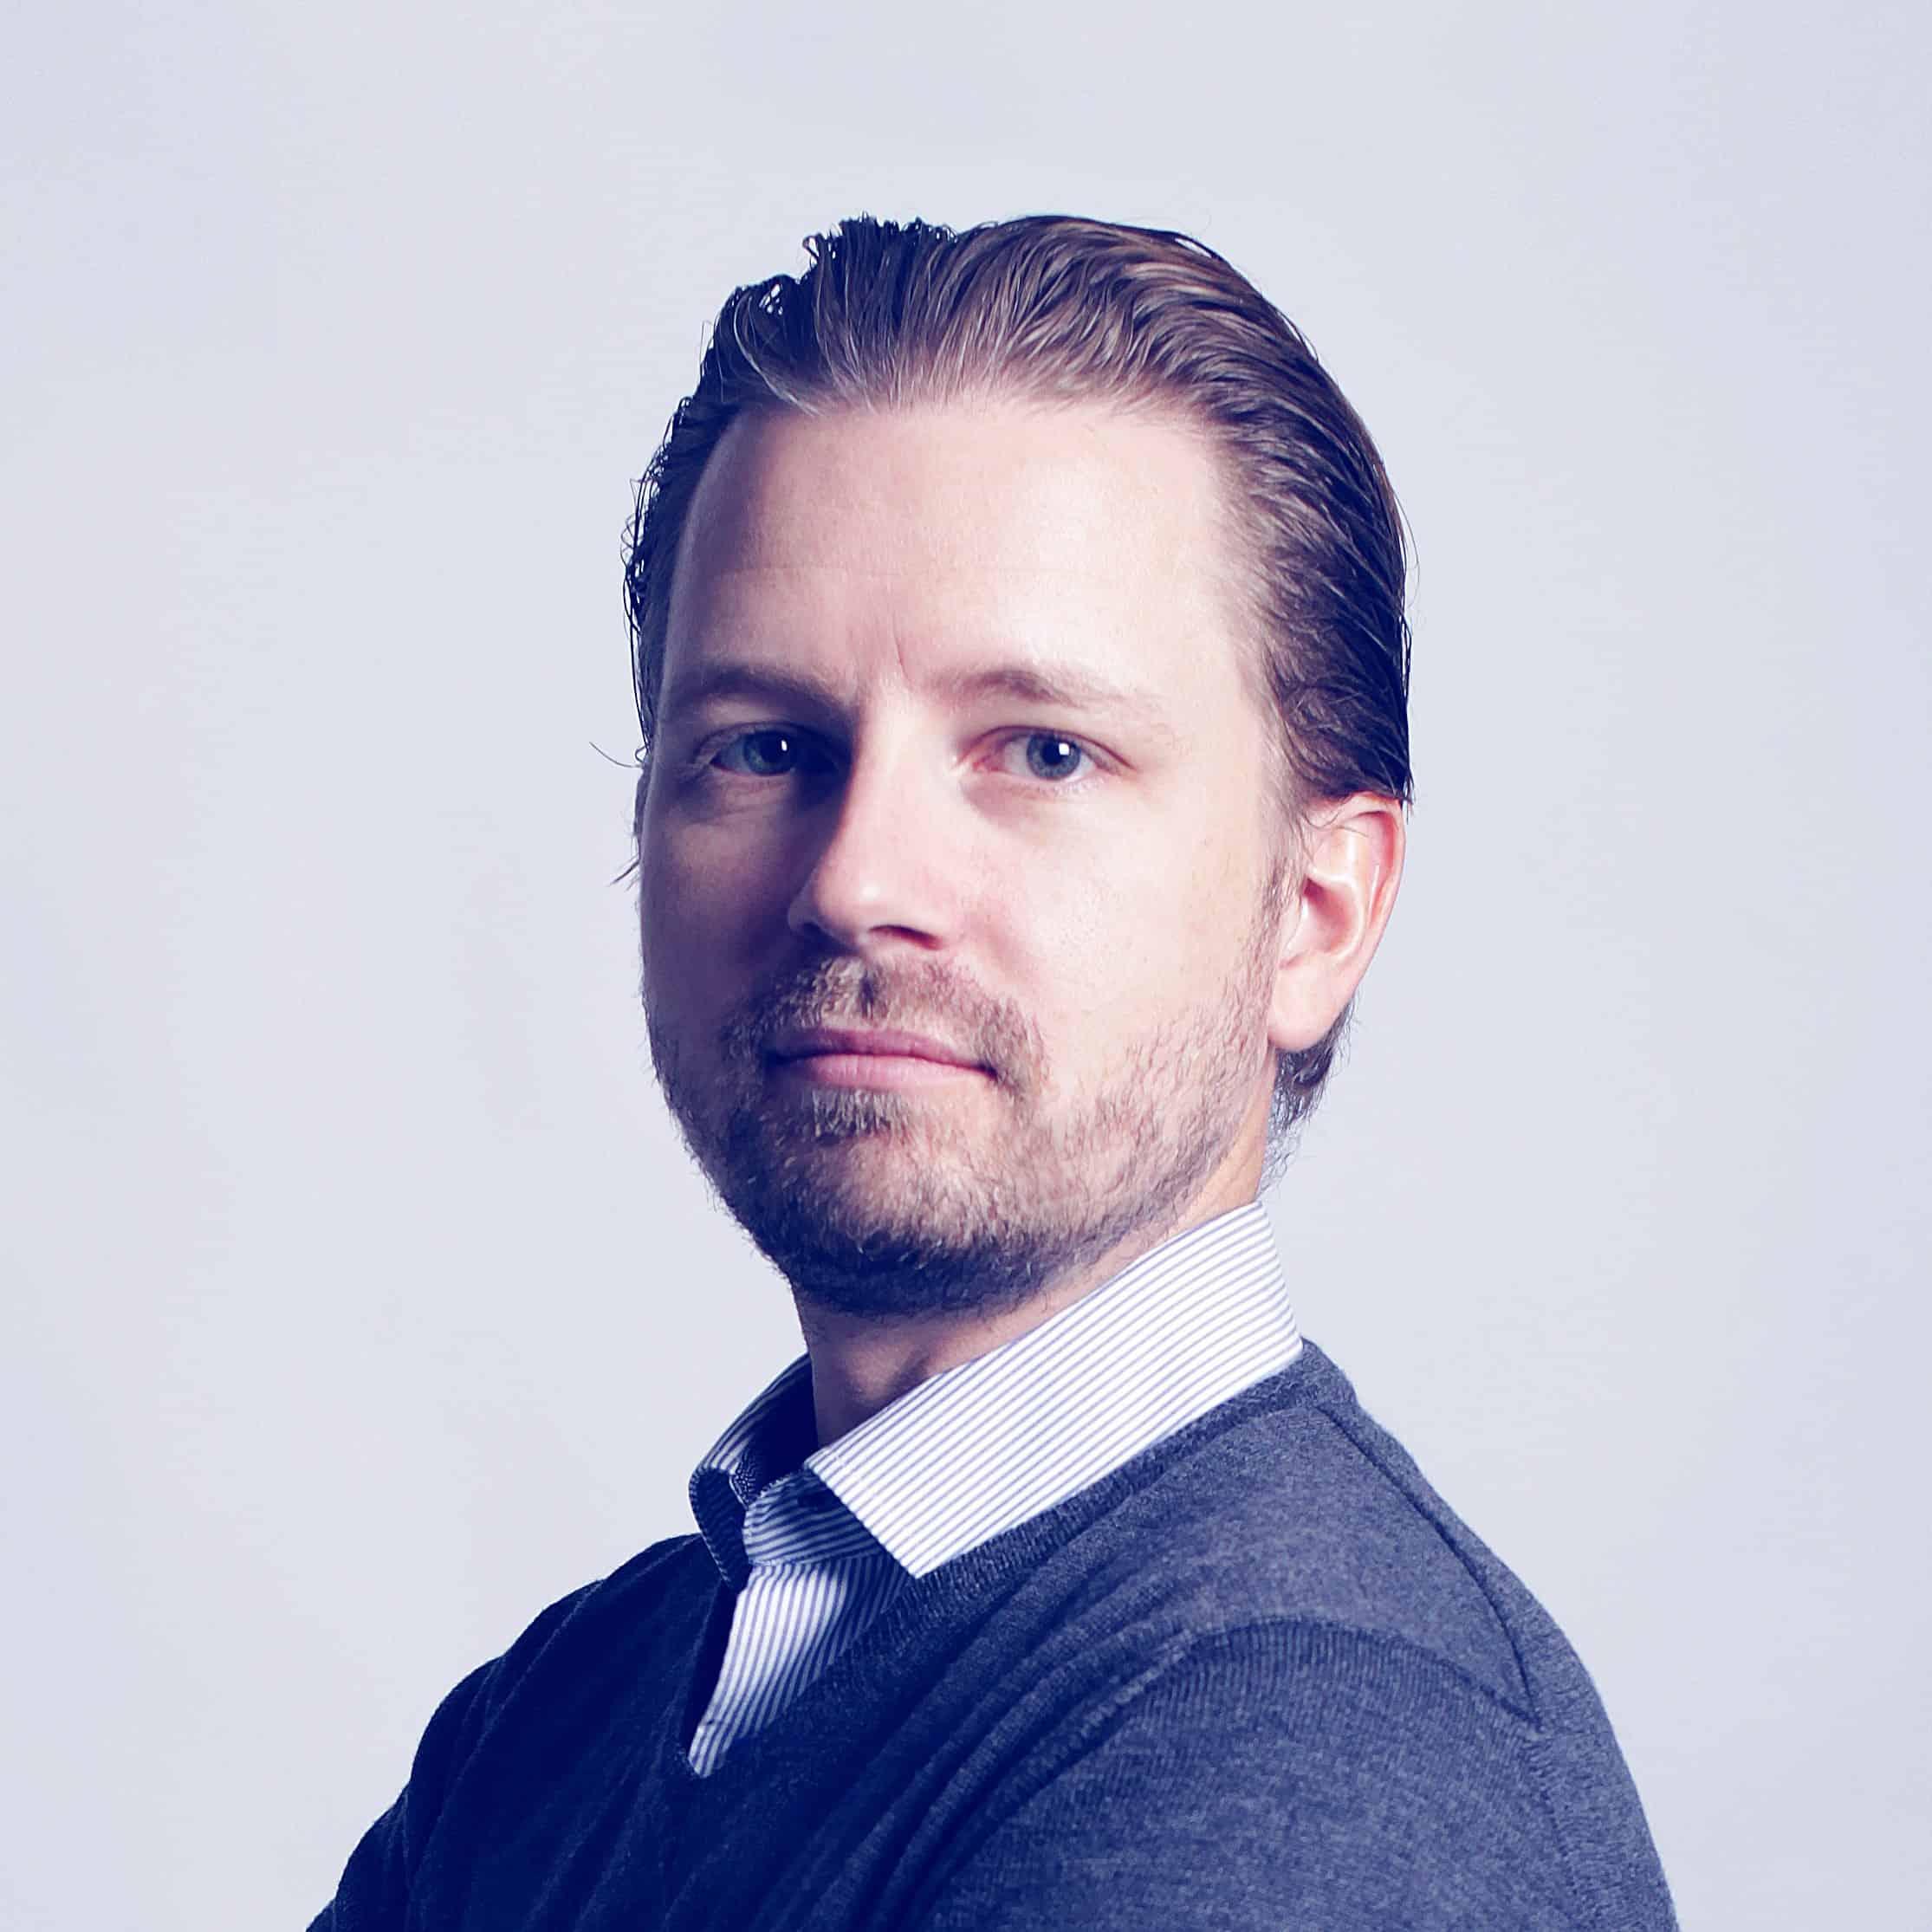 Fredrik Österdahl